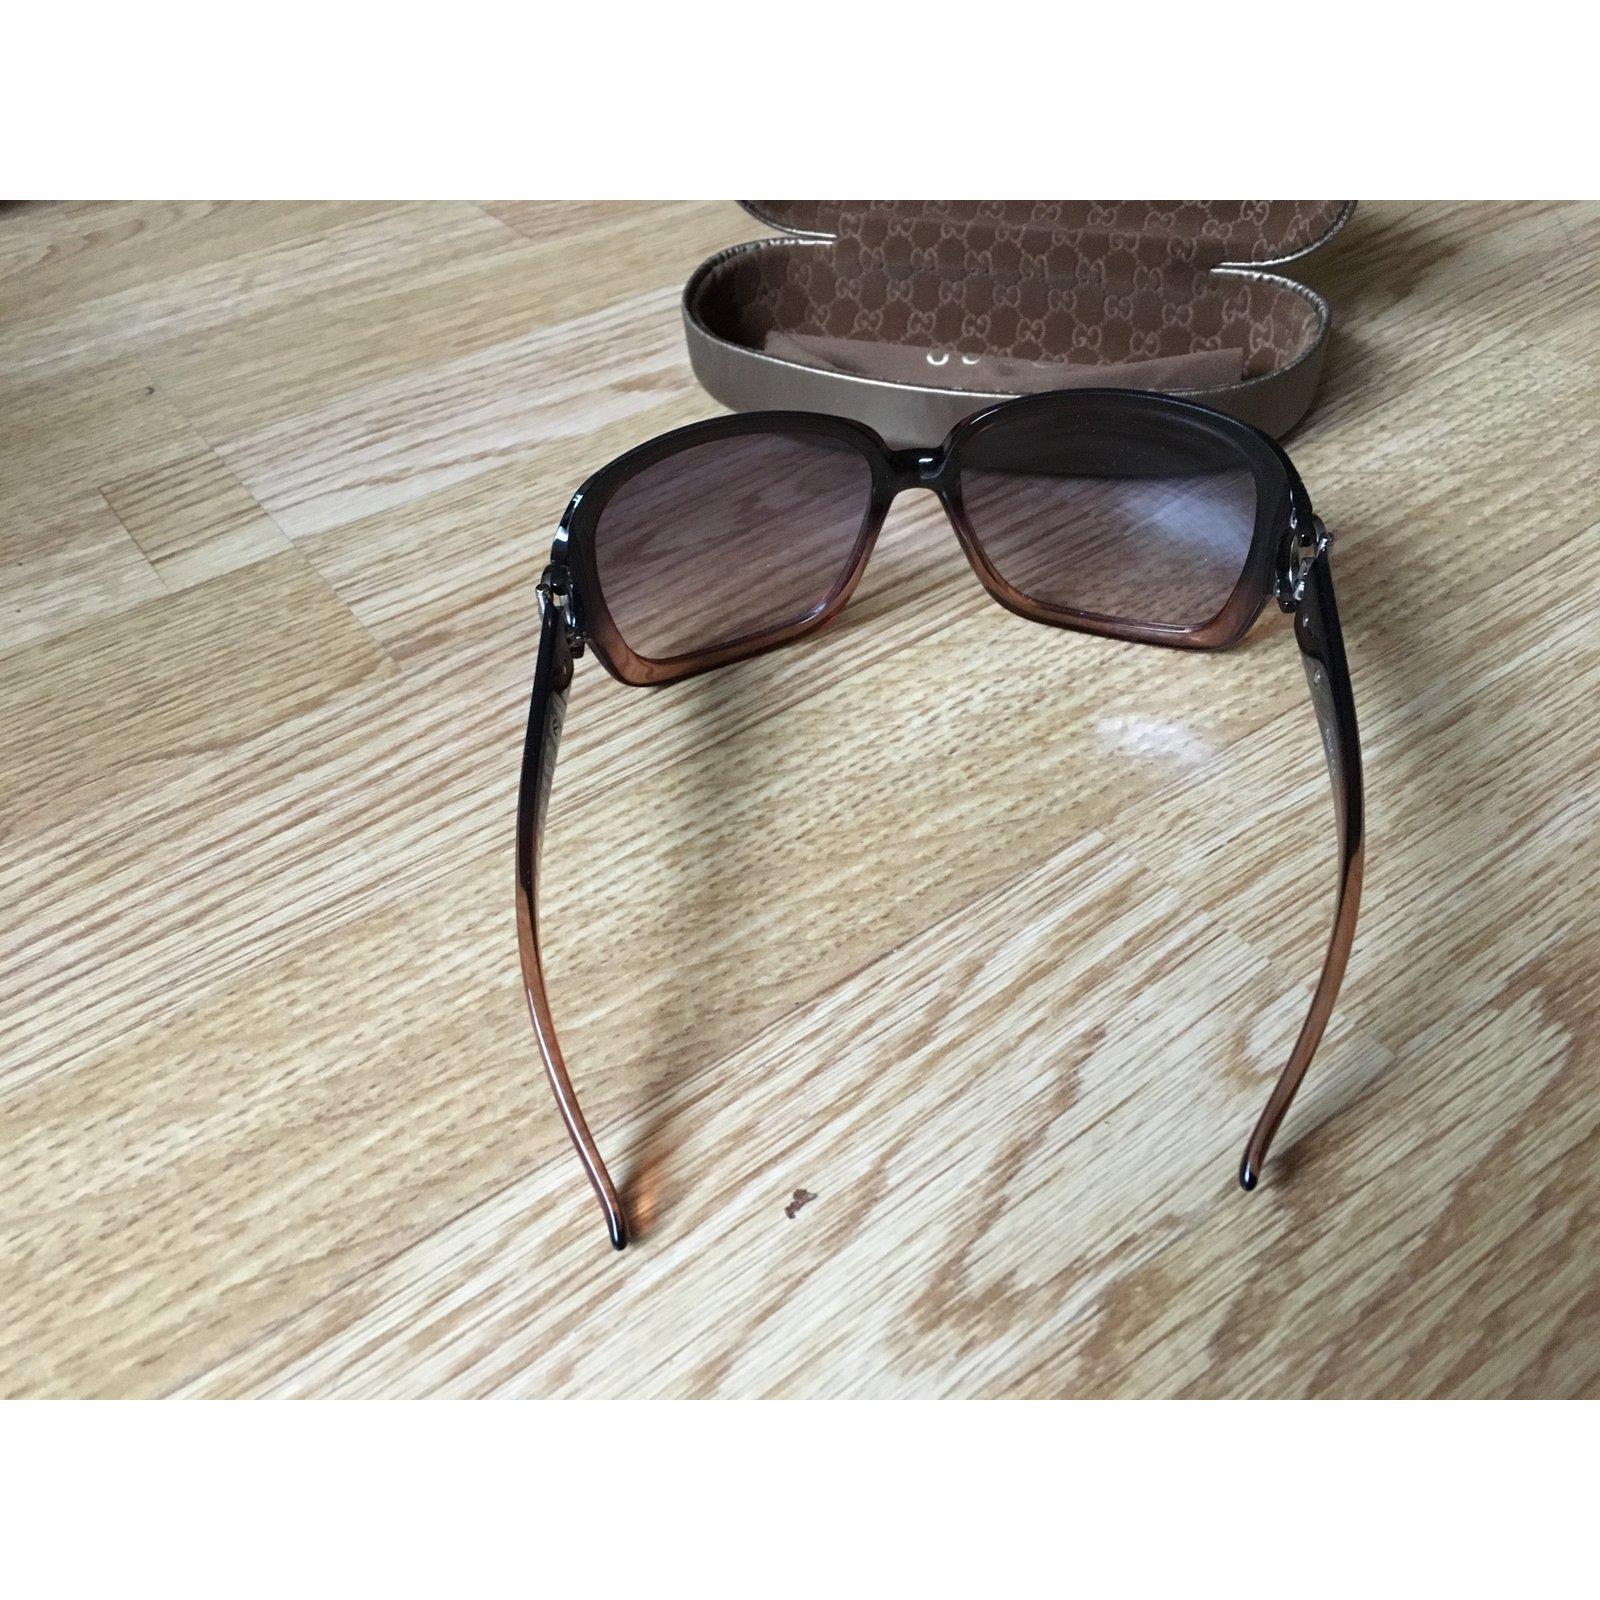 79b58d3c61a Facebook · Pin This. Gucci Sunglasses Sunglasses Plastic Blue ...